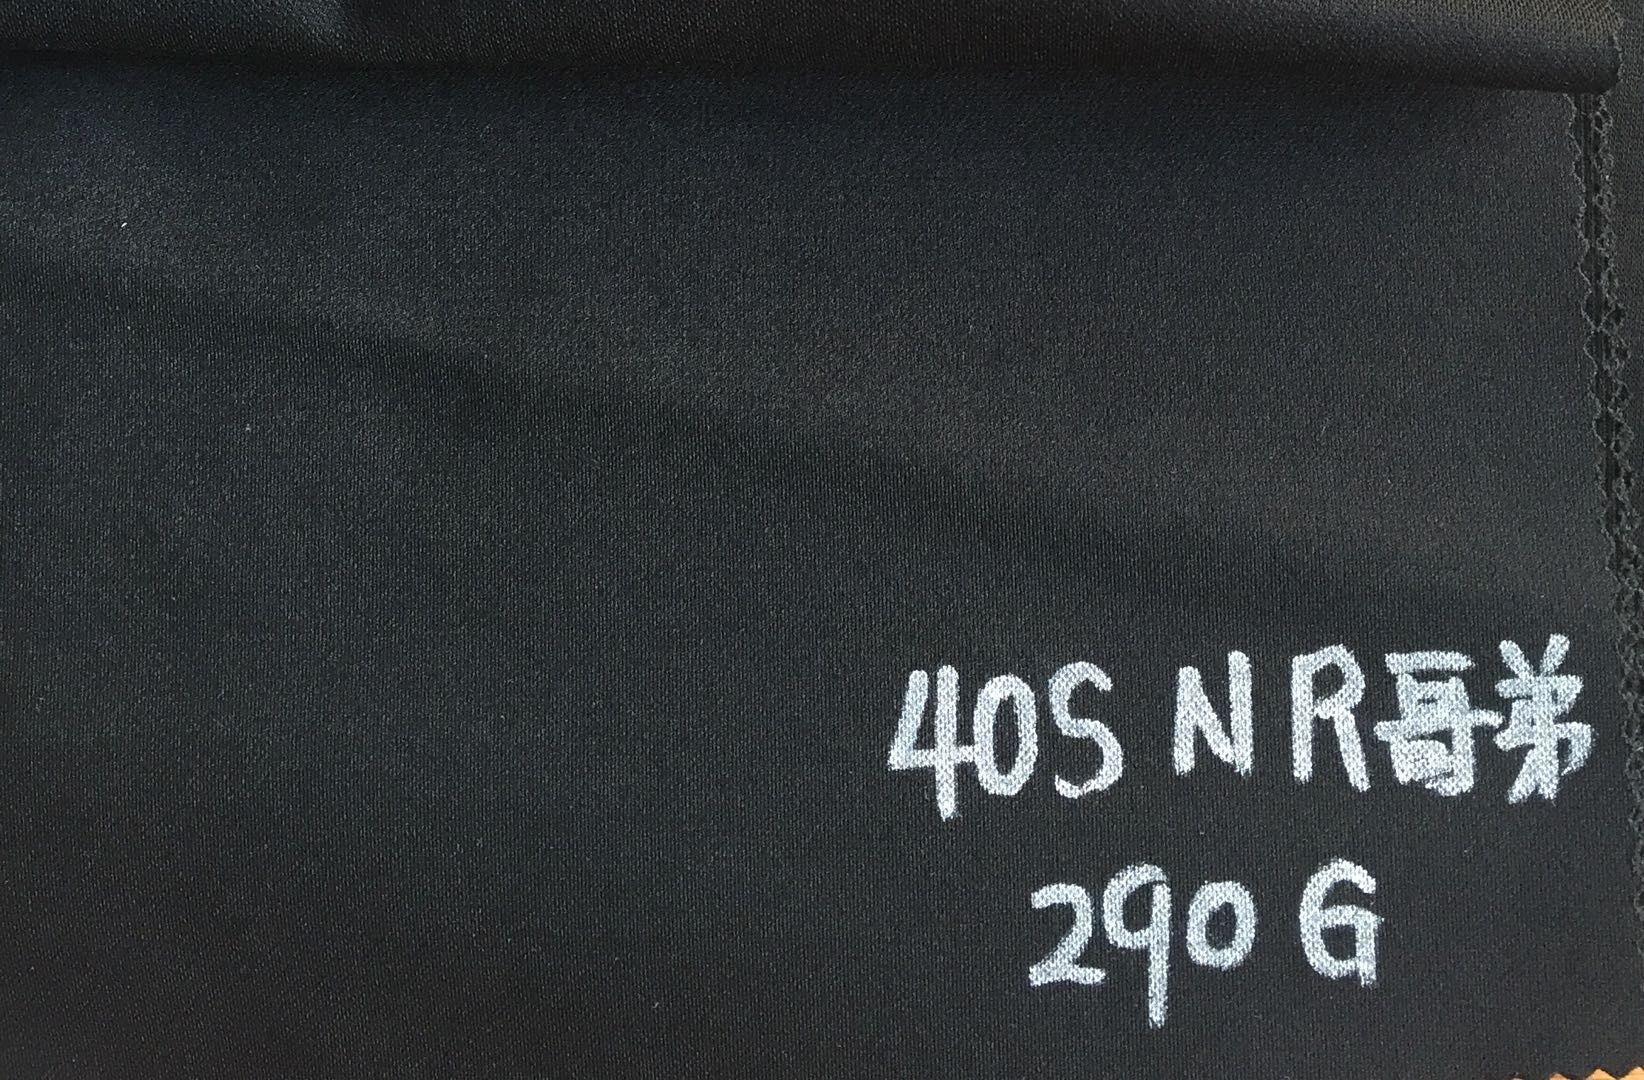 40s-NR fabric- 290-350gsm